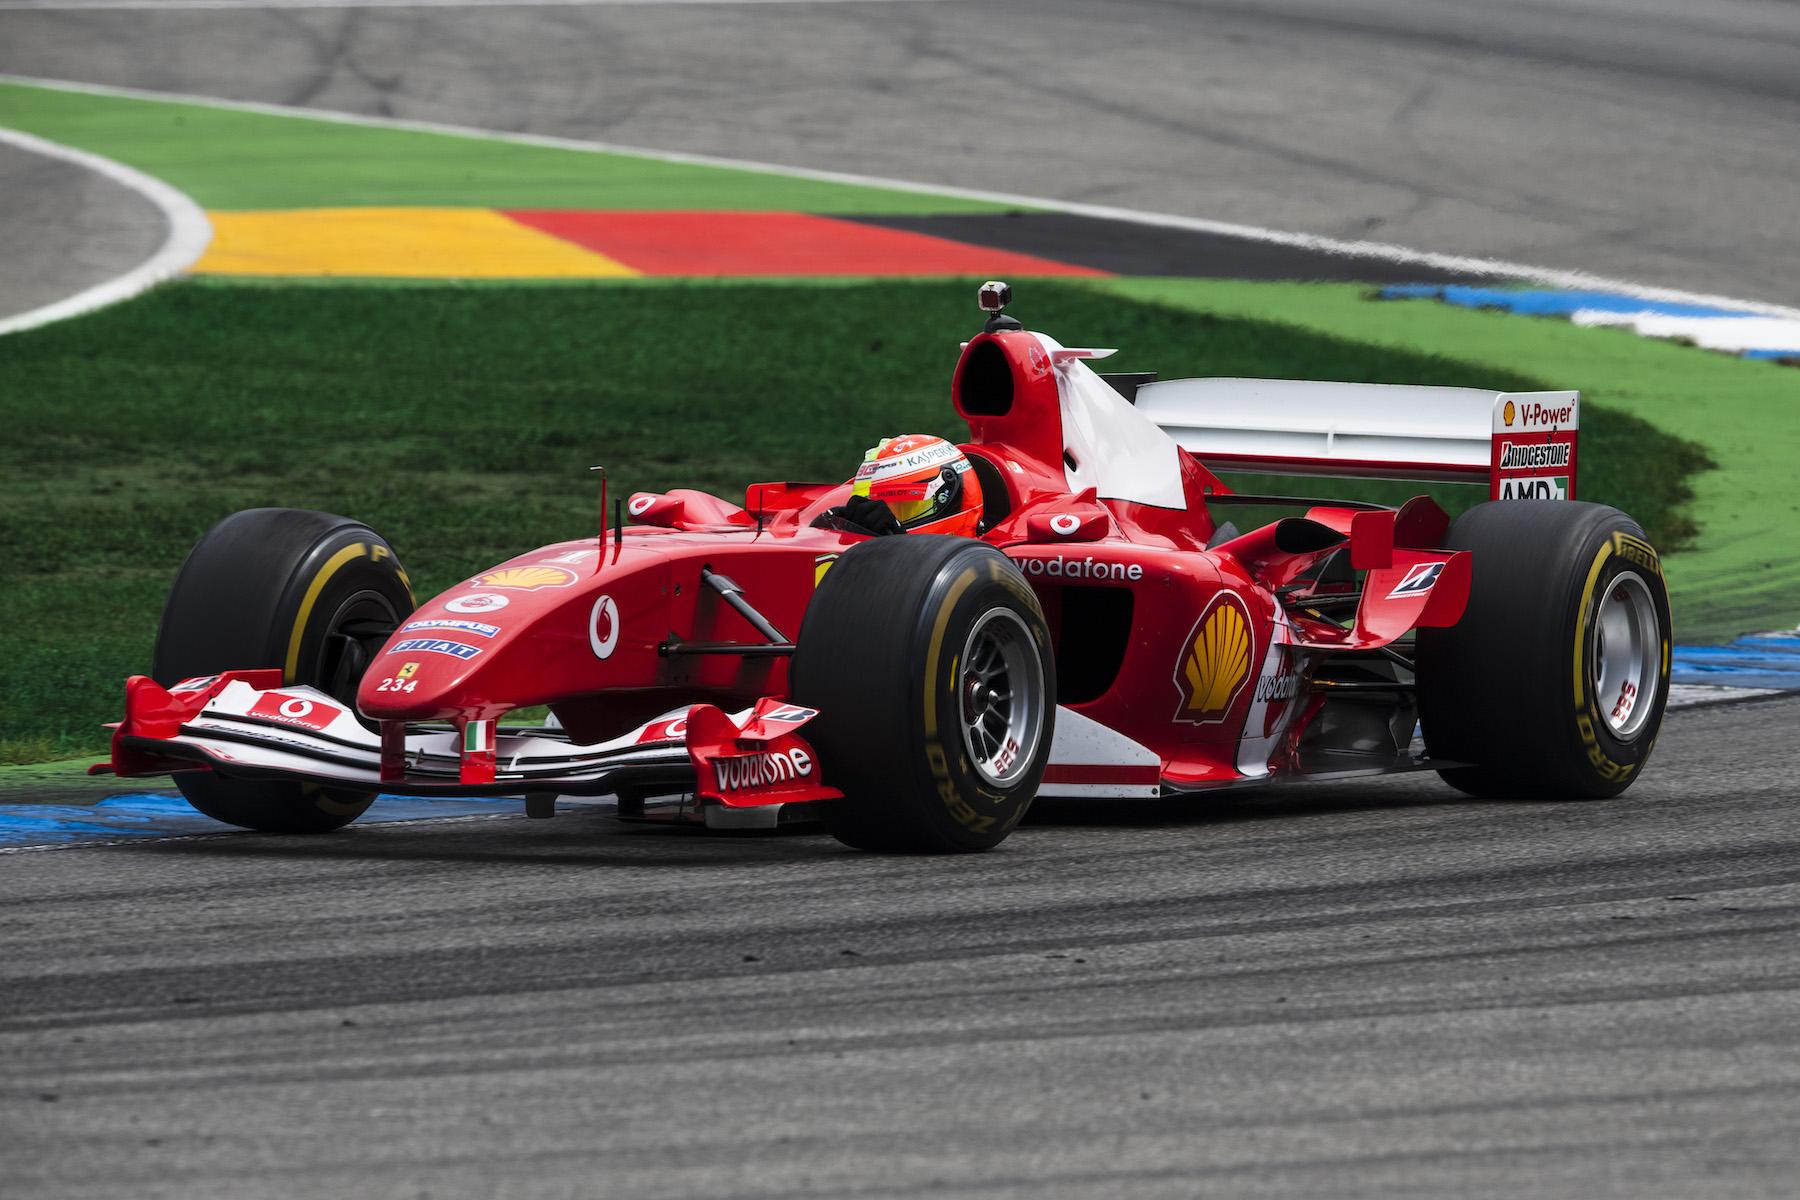 2019 Mick Schumacher | Ferrari F2004 | 2019 German GP 5 copy.jpg